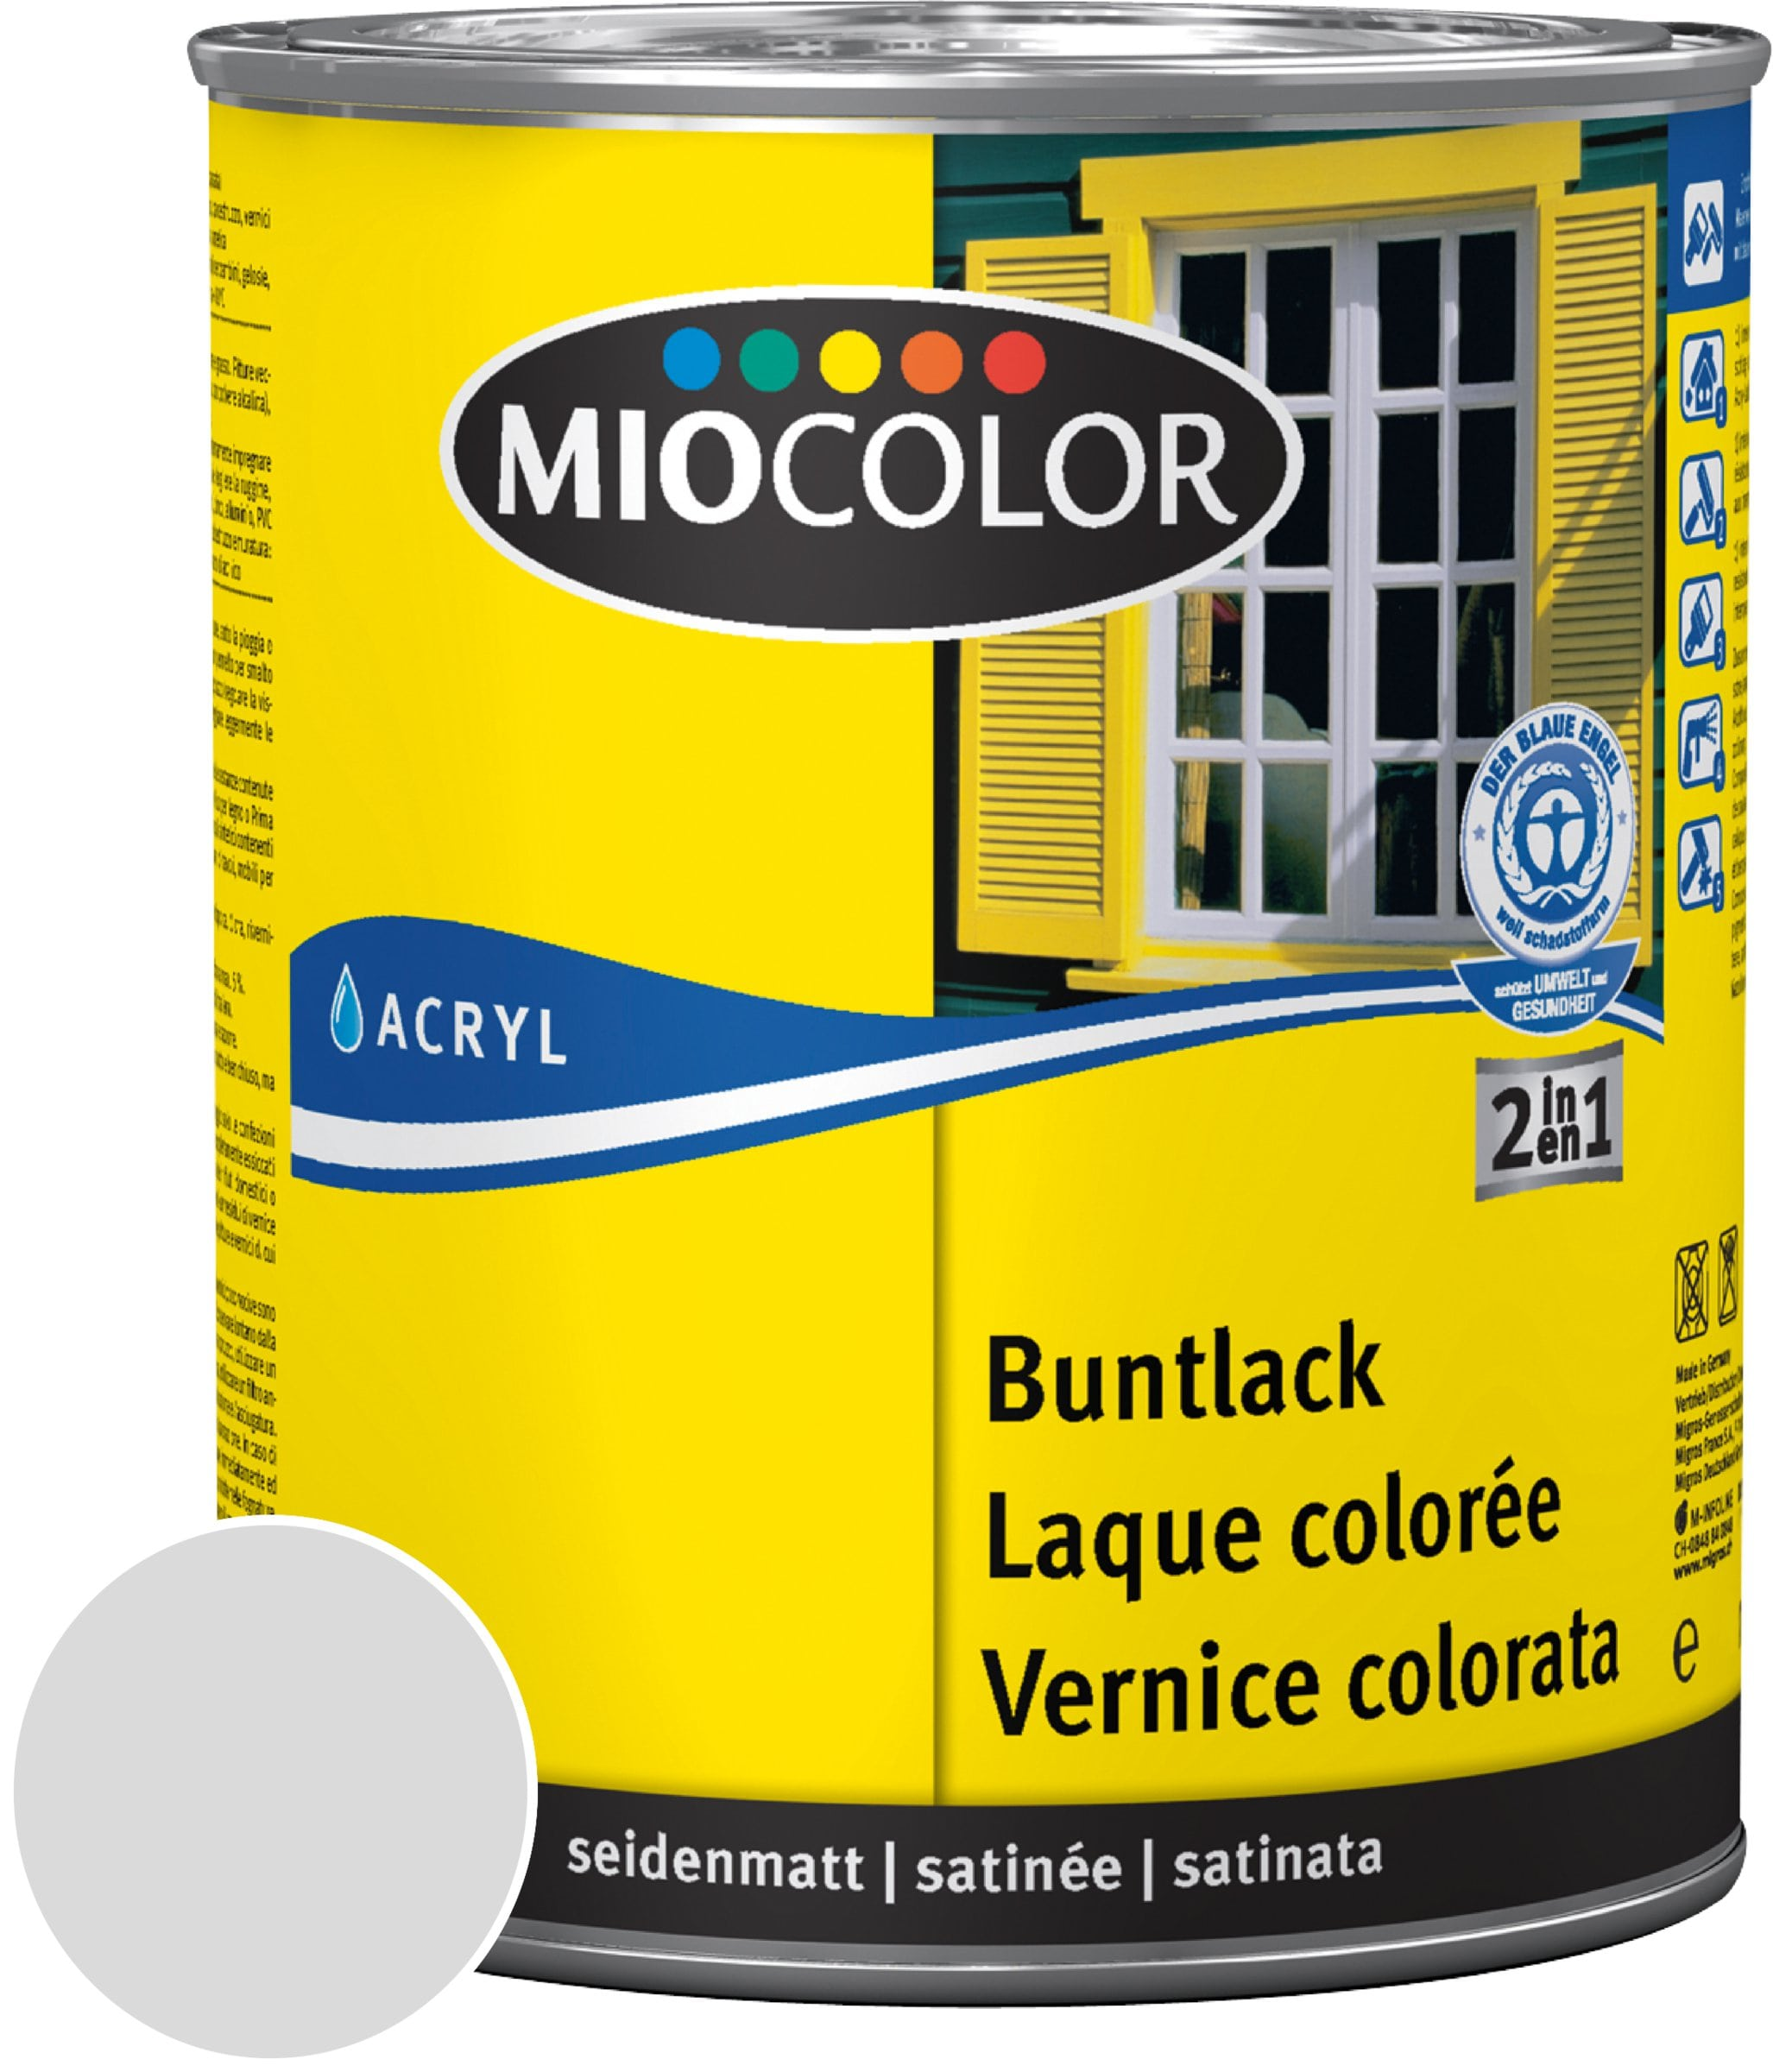 Miocolor Acryl Vernice colorata satinata Grigio chiaro 750 ml